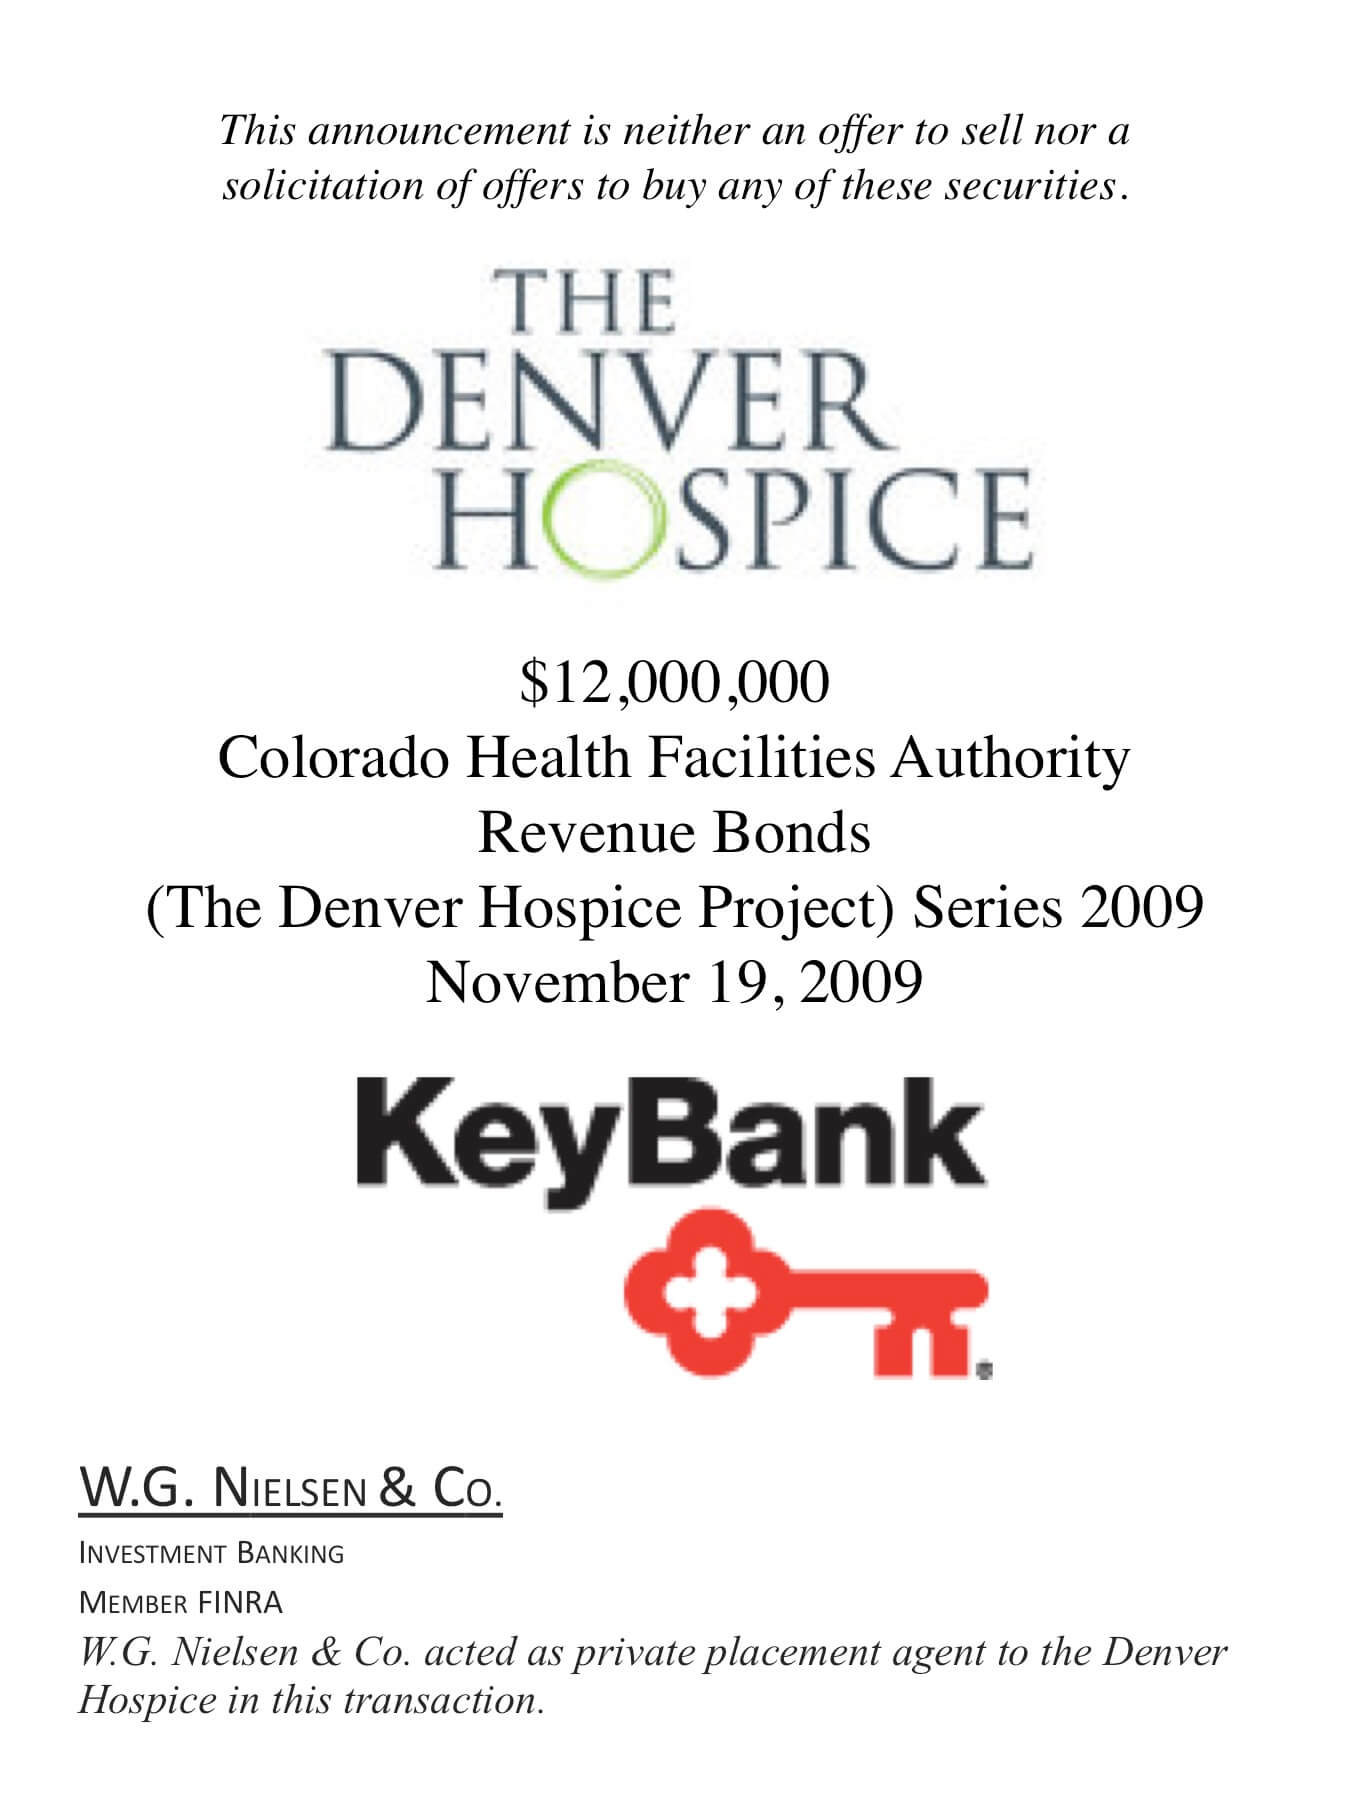 denver hospice investment banking transaction